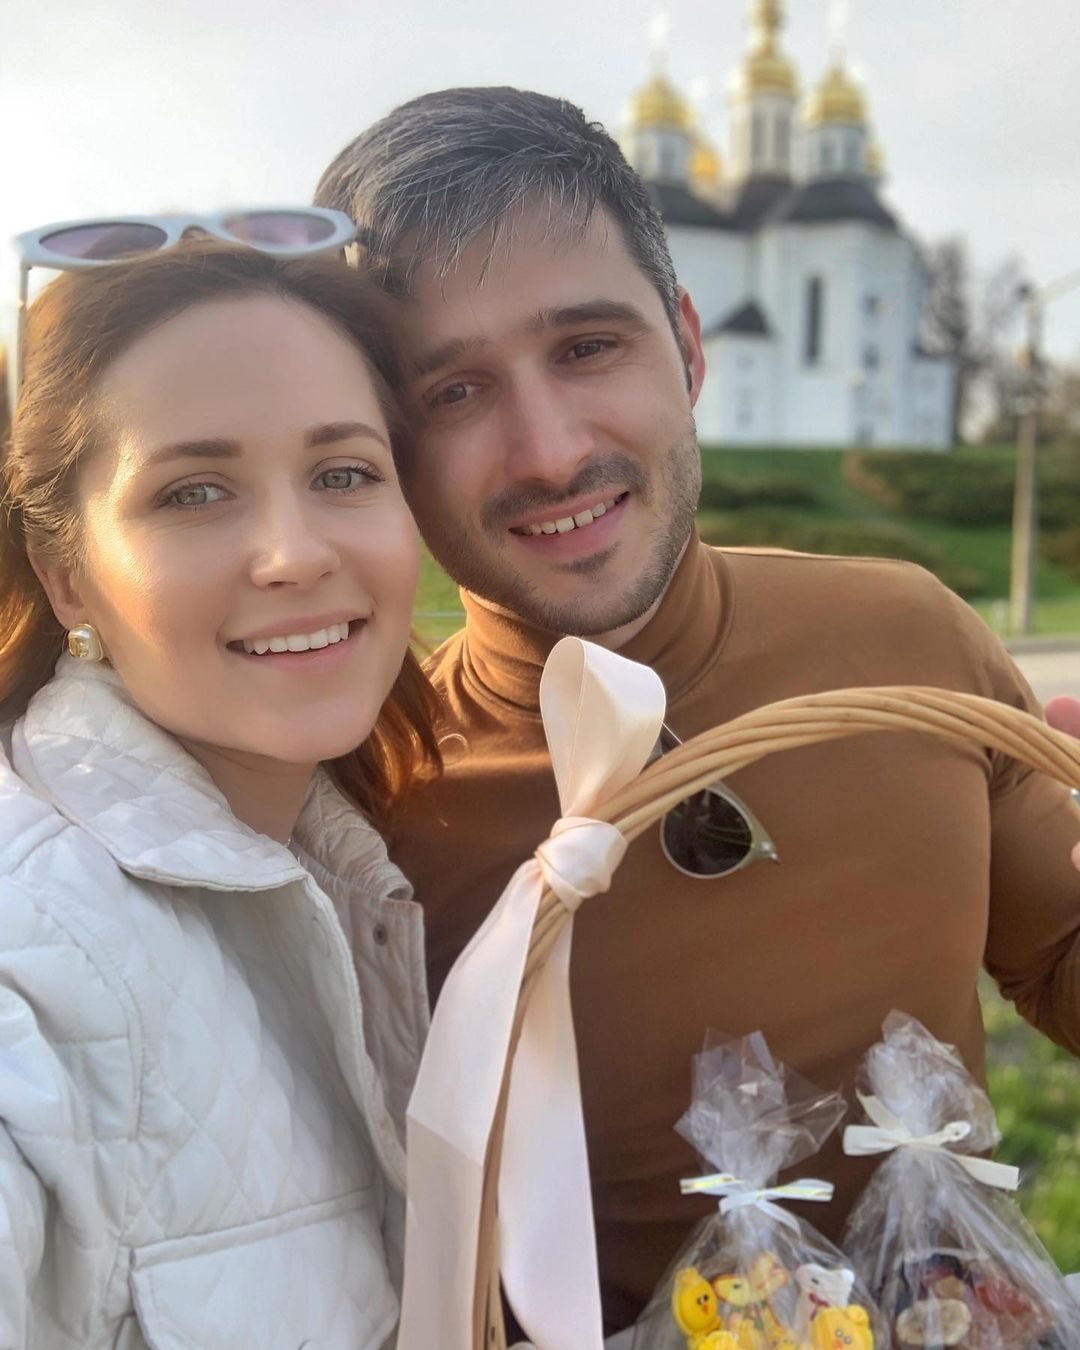 украинские звезды пасха 2021 как отметили паски крашанки декор наталка денисенко андрей фединчик